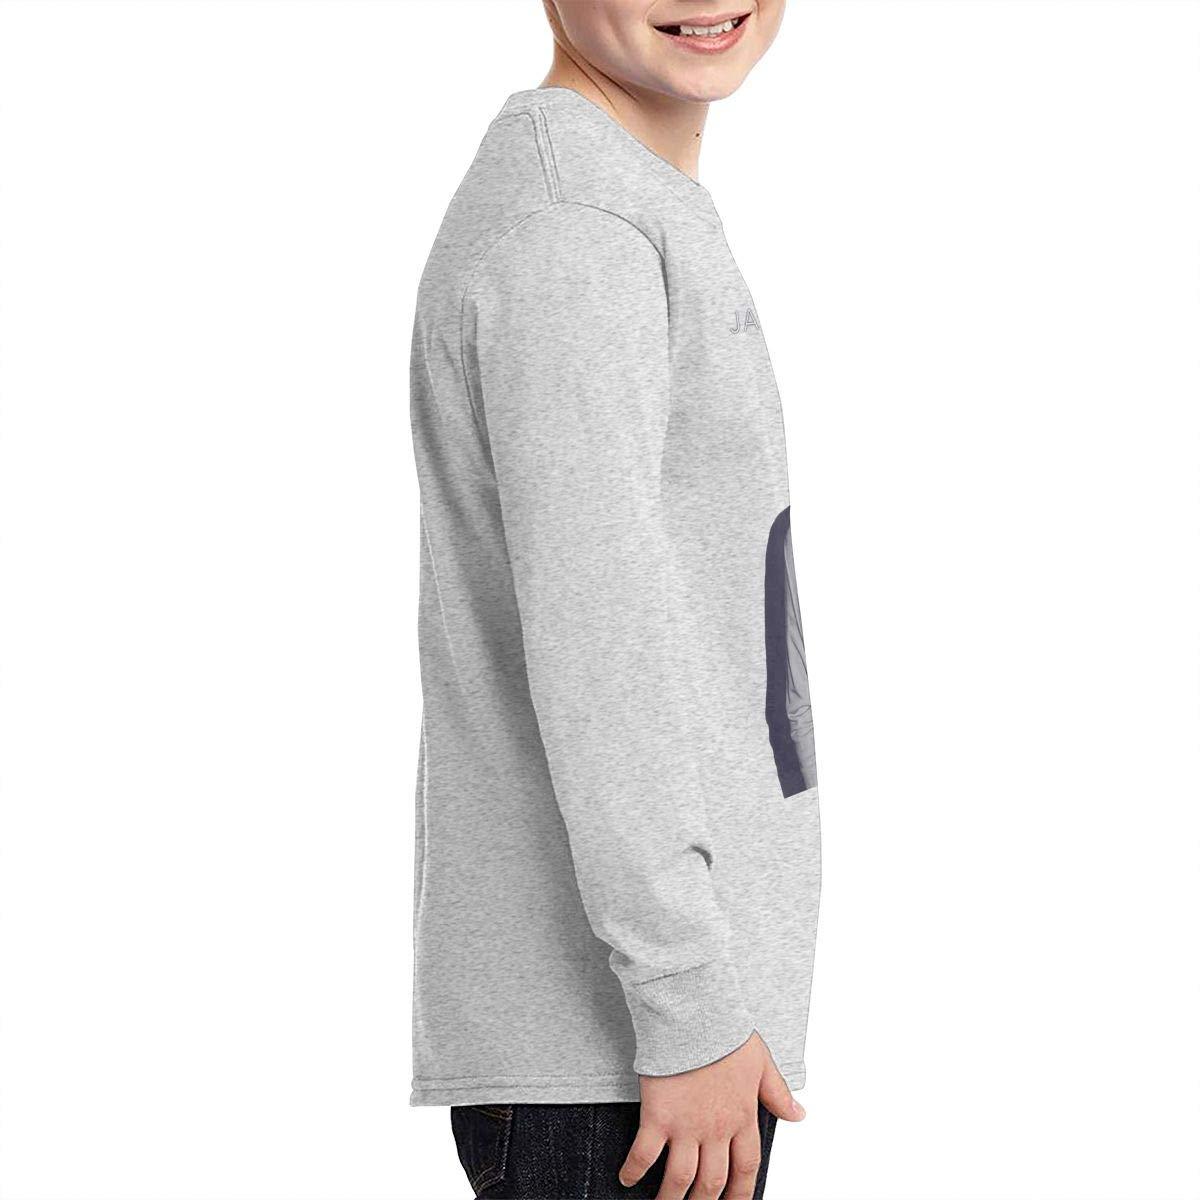 HangHisi James Arthur Boys /& Girls O Neck Regular Style Tee Long Sleeve T Shirt Leisure